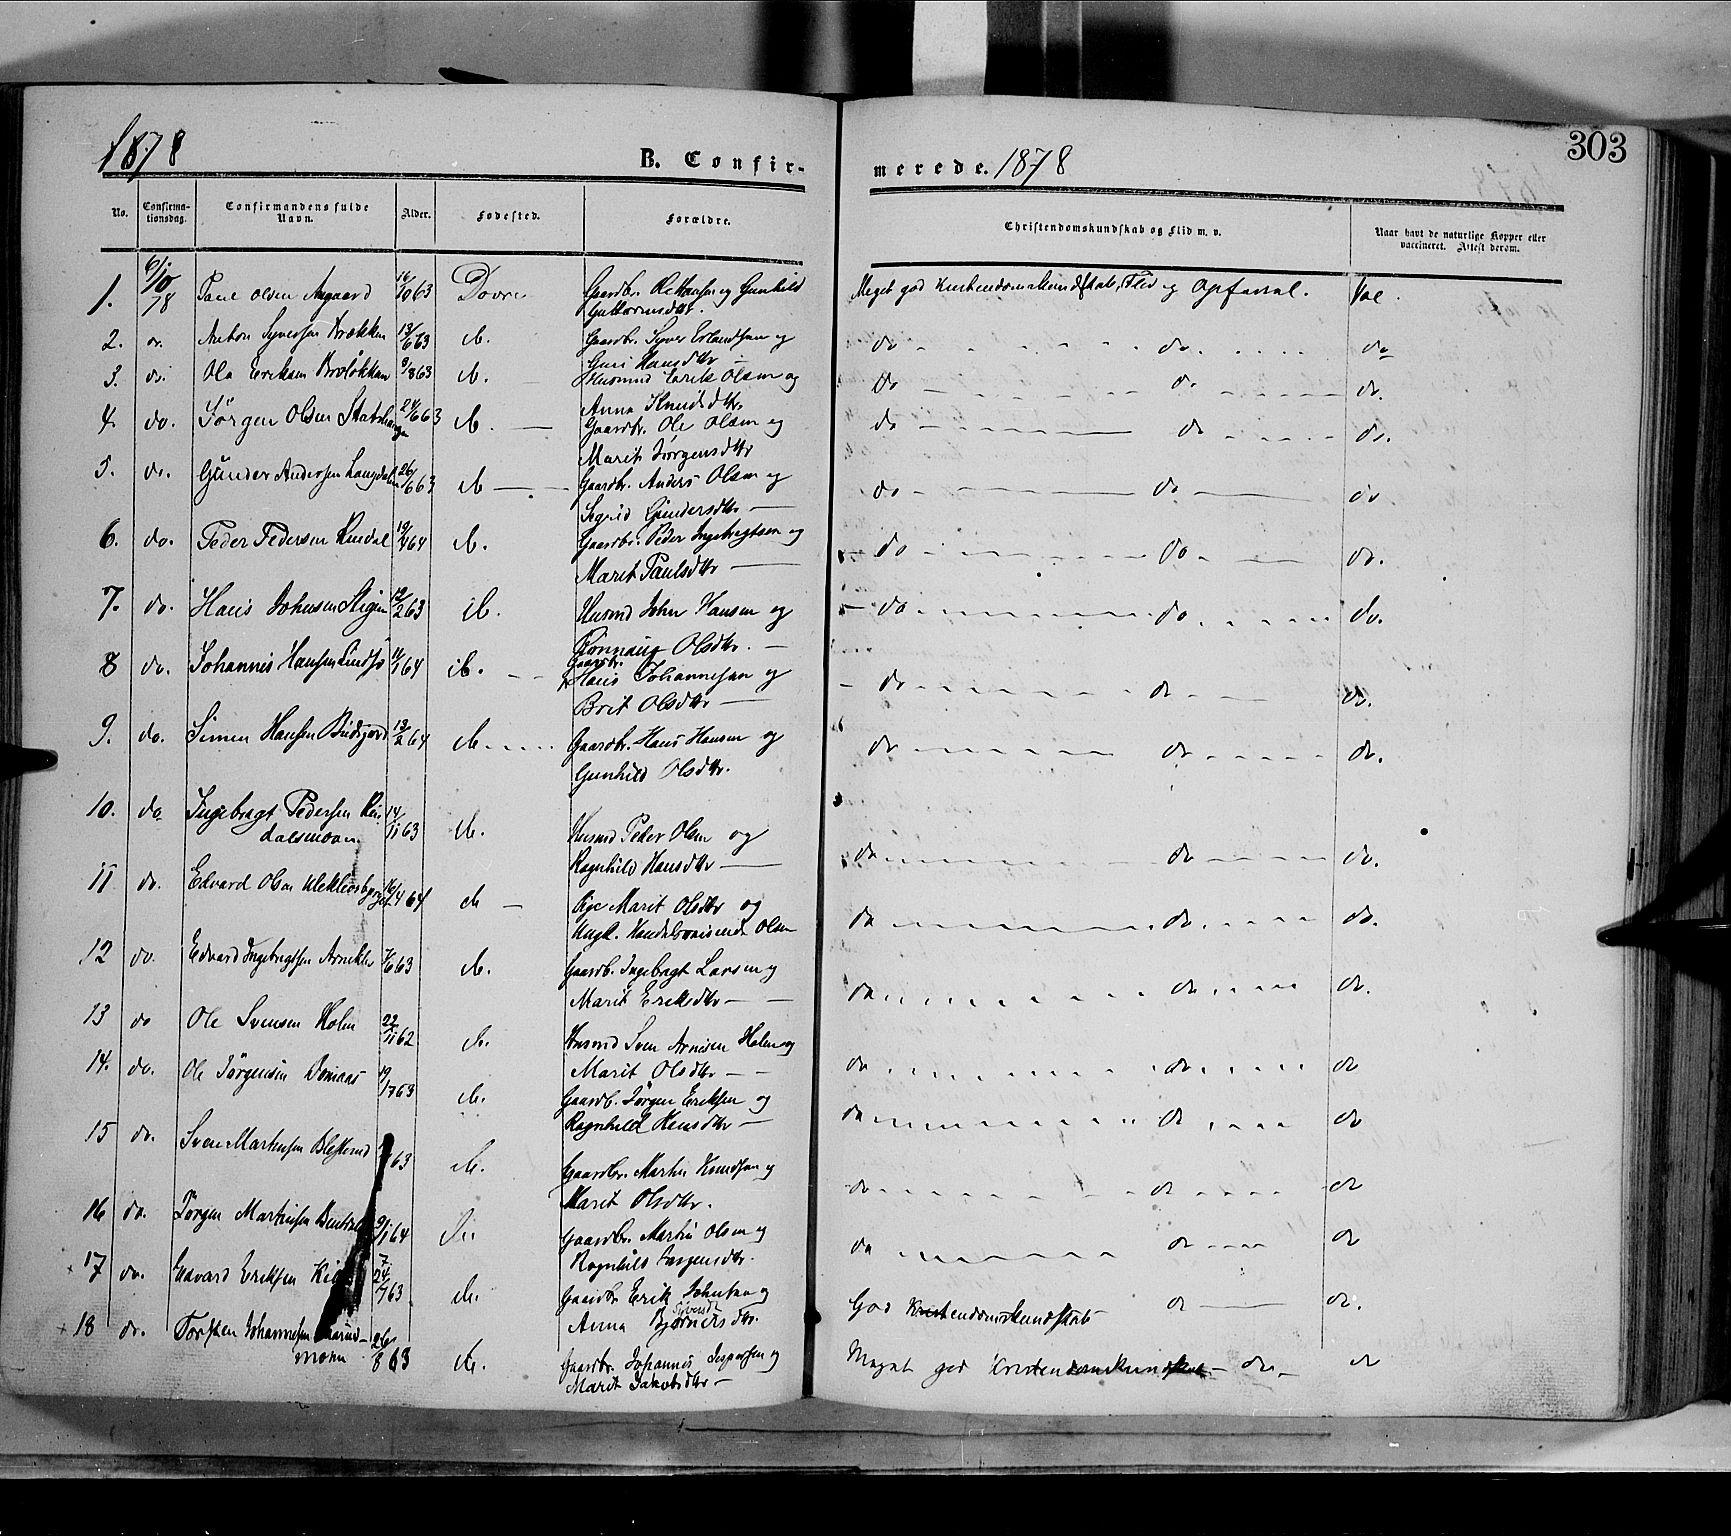 SAH, Dovre prestekontor, Ministerialbok nr. 1, 1854-1878, s. 303